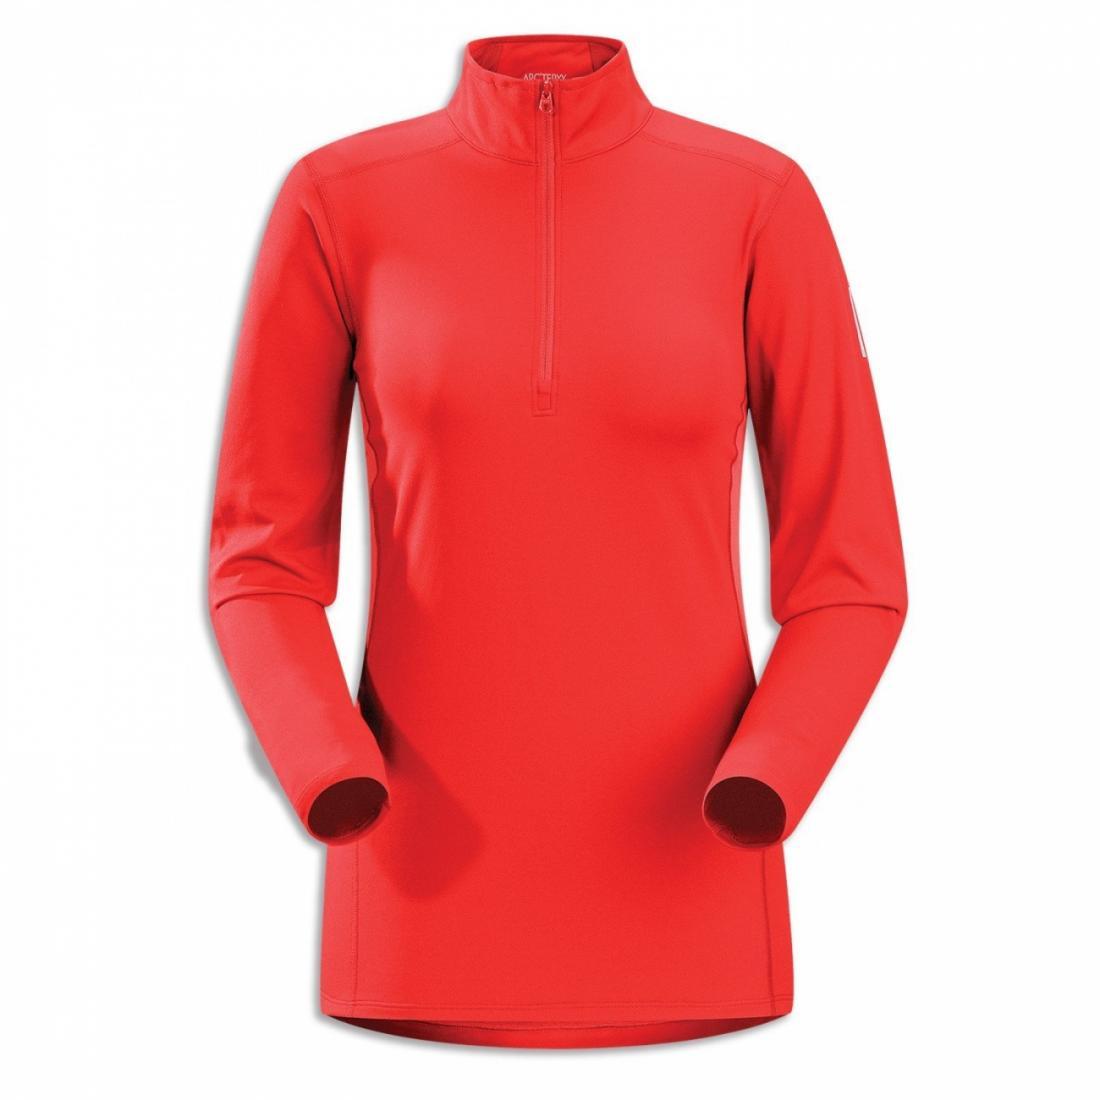 Термобелье футболка Phase AR Zip Neck жен. длин.рукавФутболки<br><br><br>Цвет: Красный<br>Размер: M